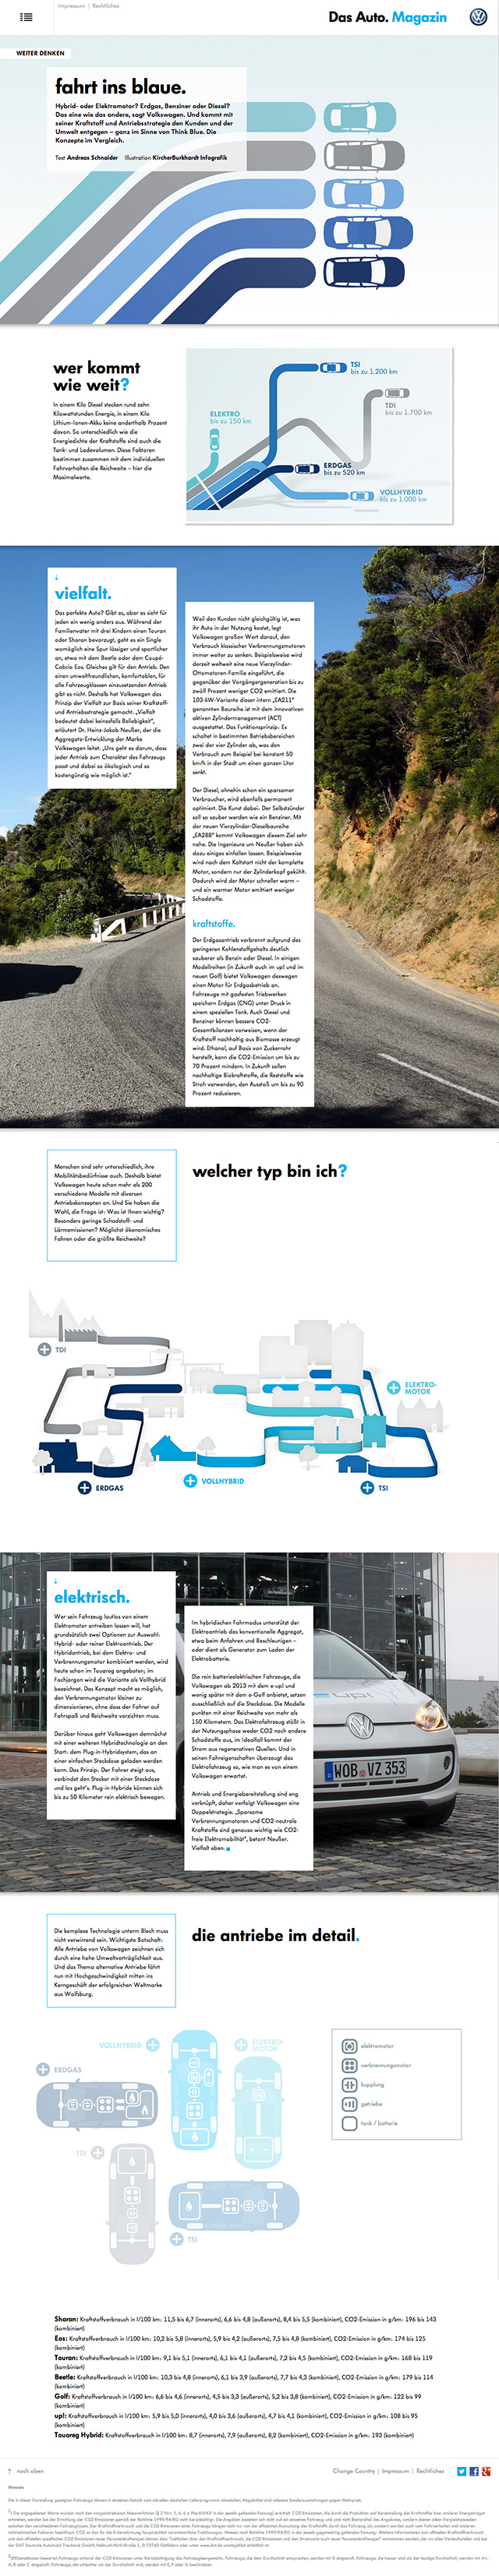 VW Das Auto Magazine Article Page